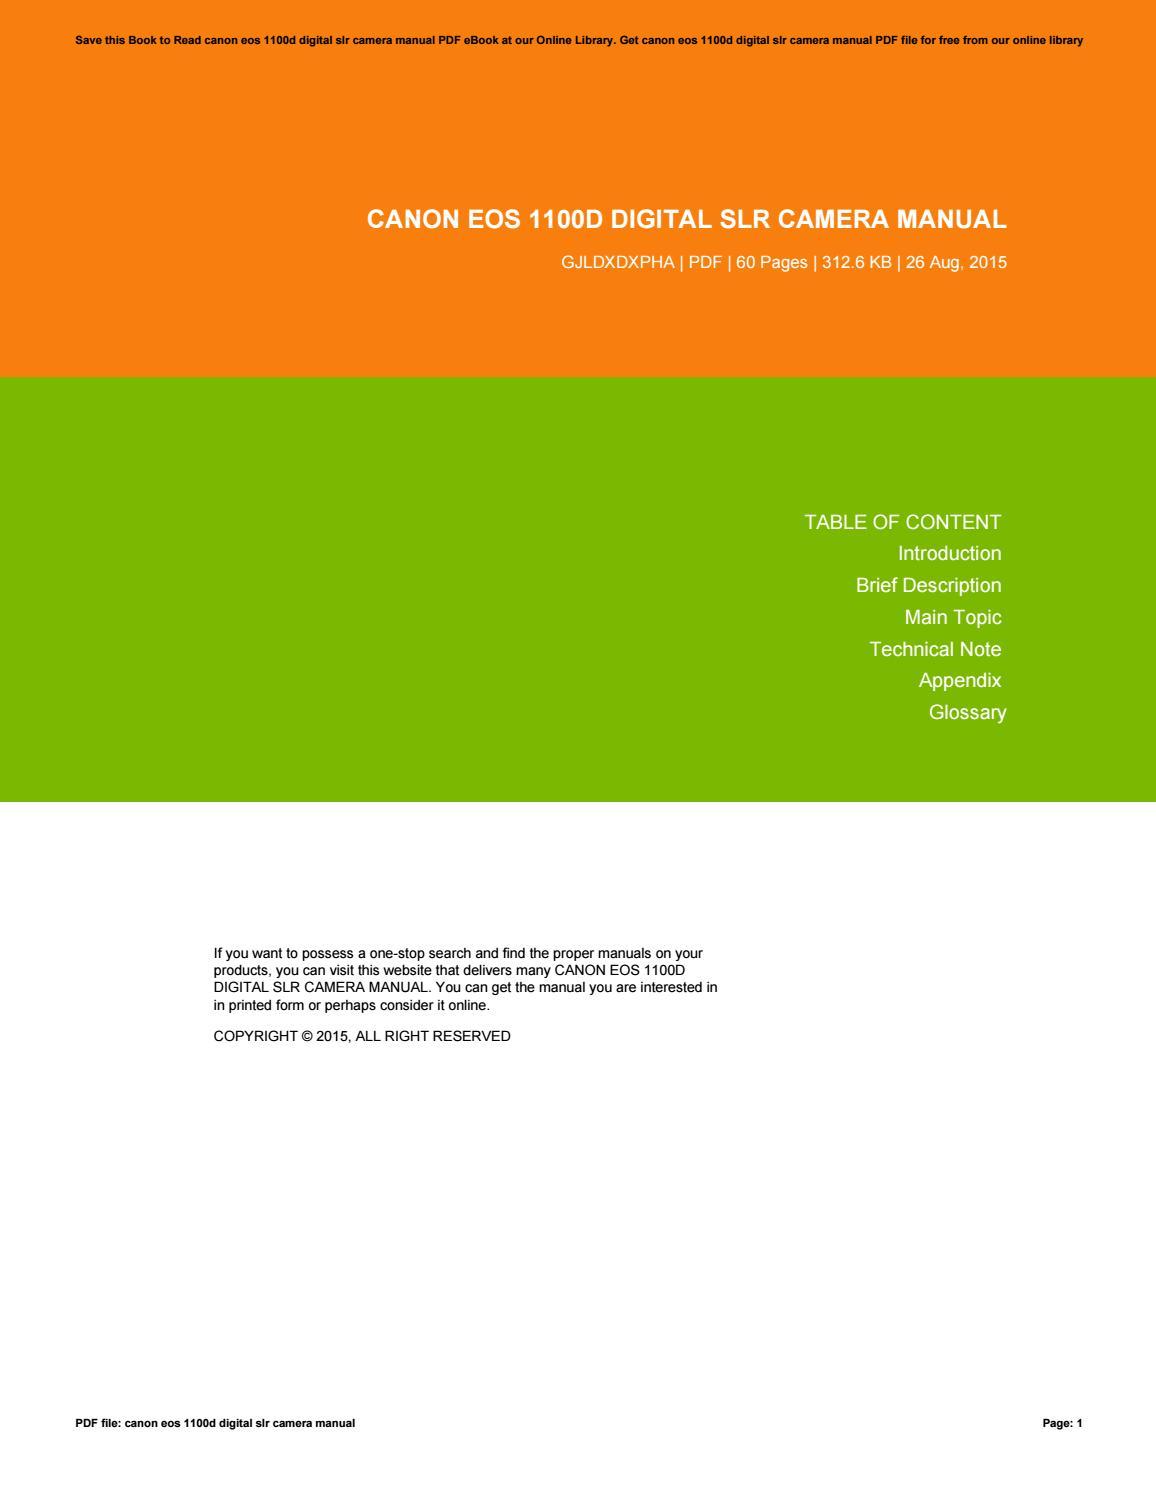 Cm4730 mfp manual ebook array canon all in one manual ebook rh canon all in one manual ebook thepivotpoint fandeluxe Gallery